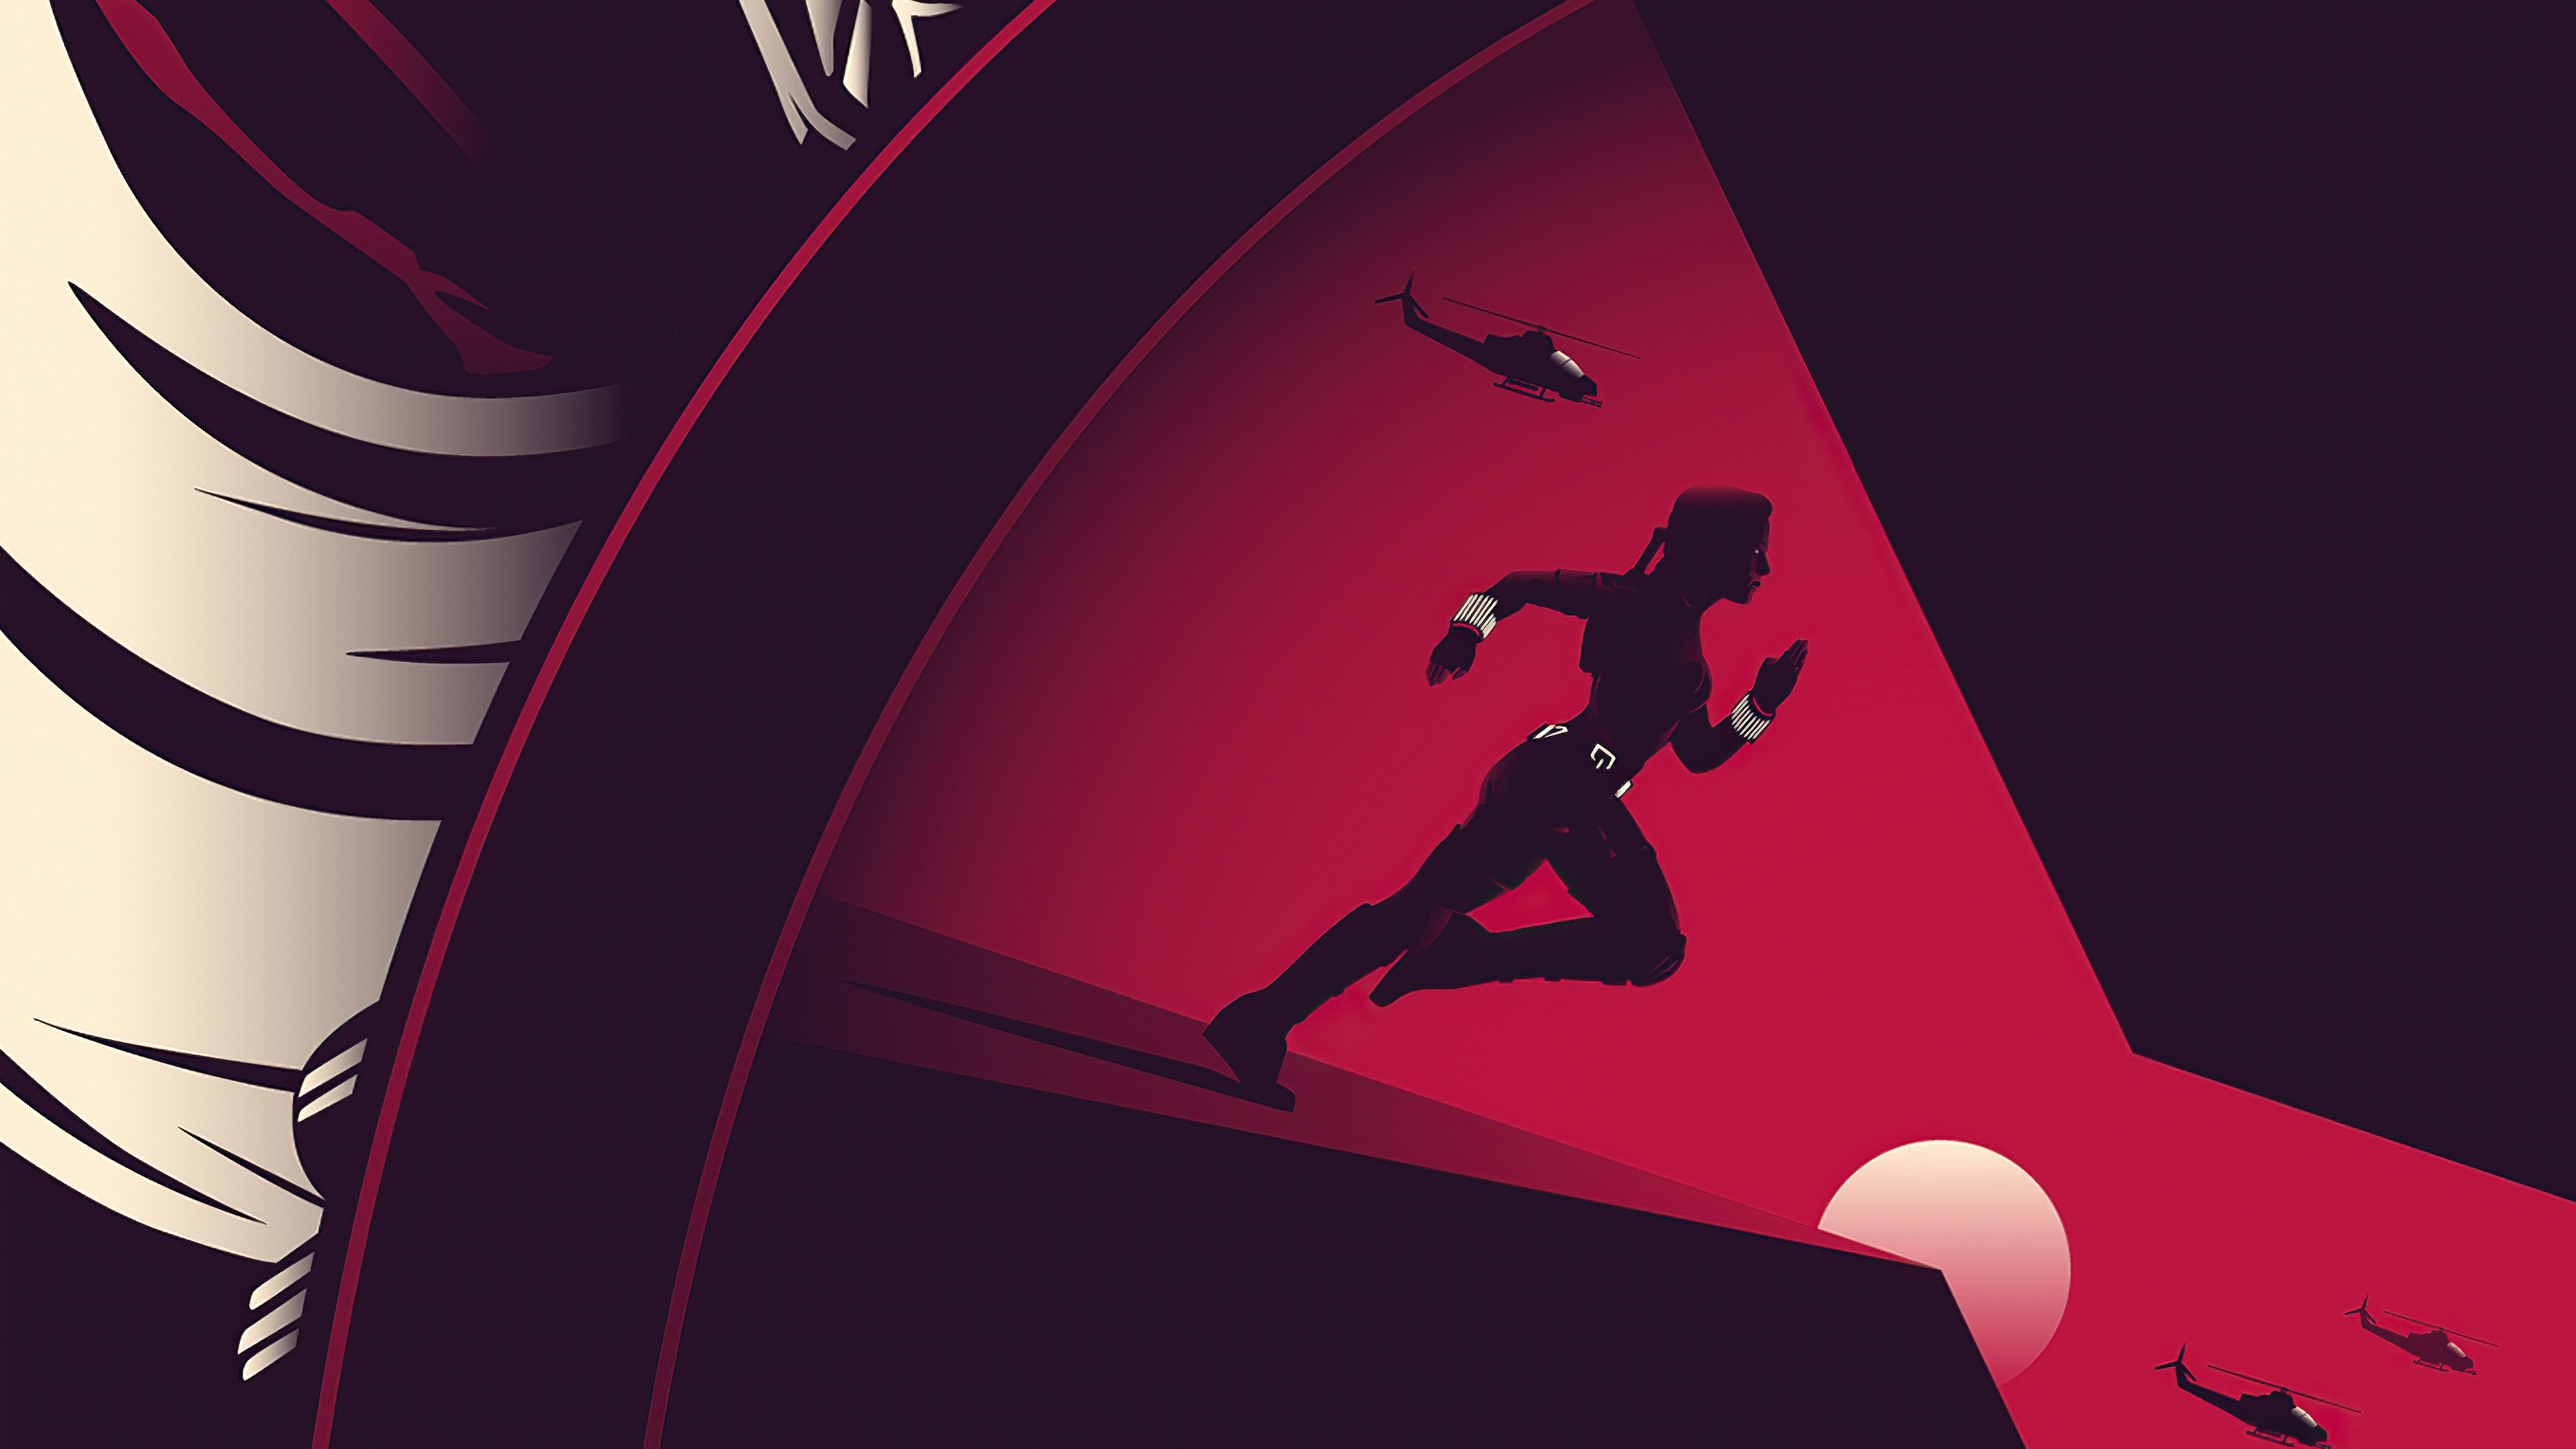 Fondos de pantalla Black Widow Fan art Minimalista